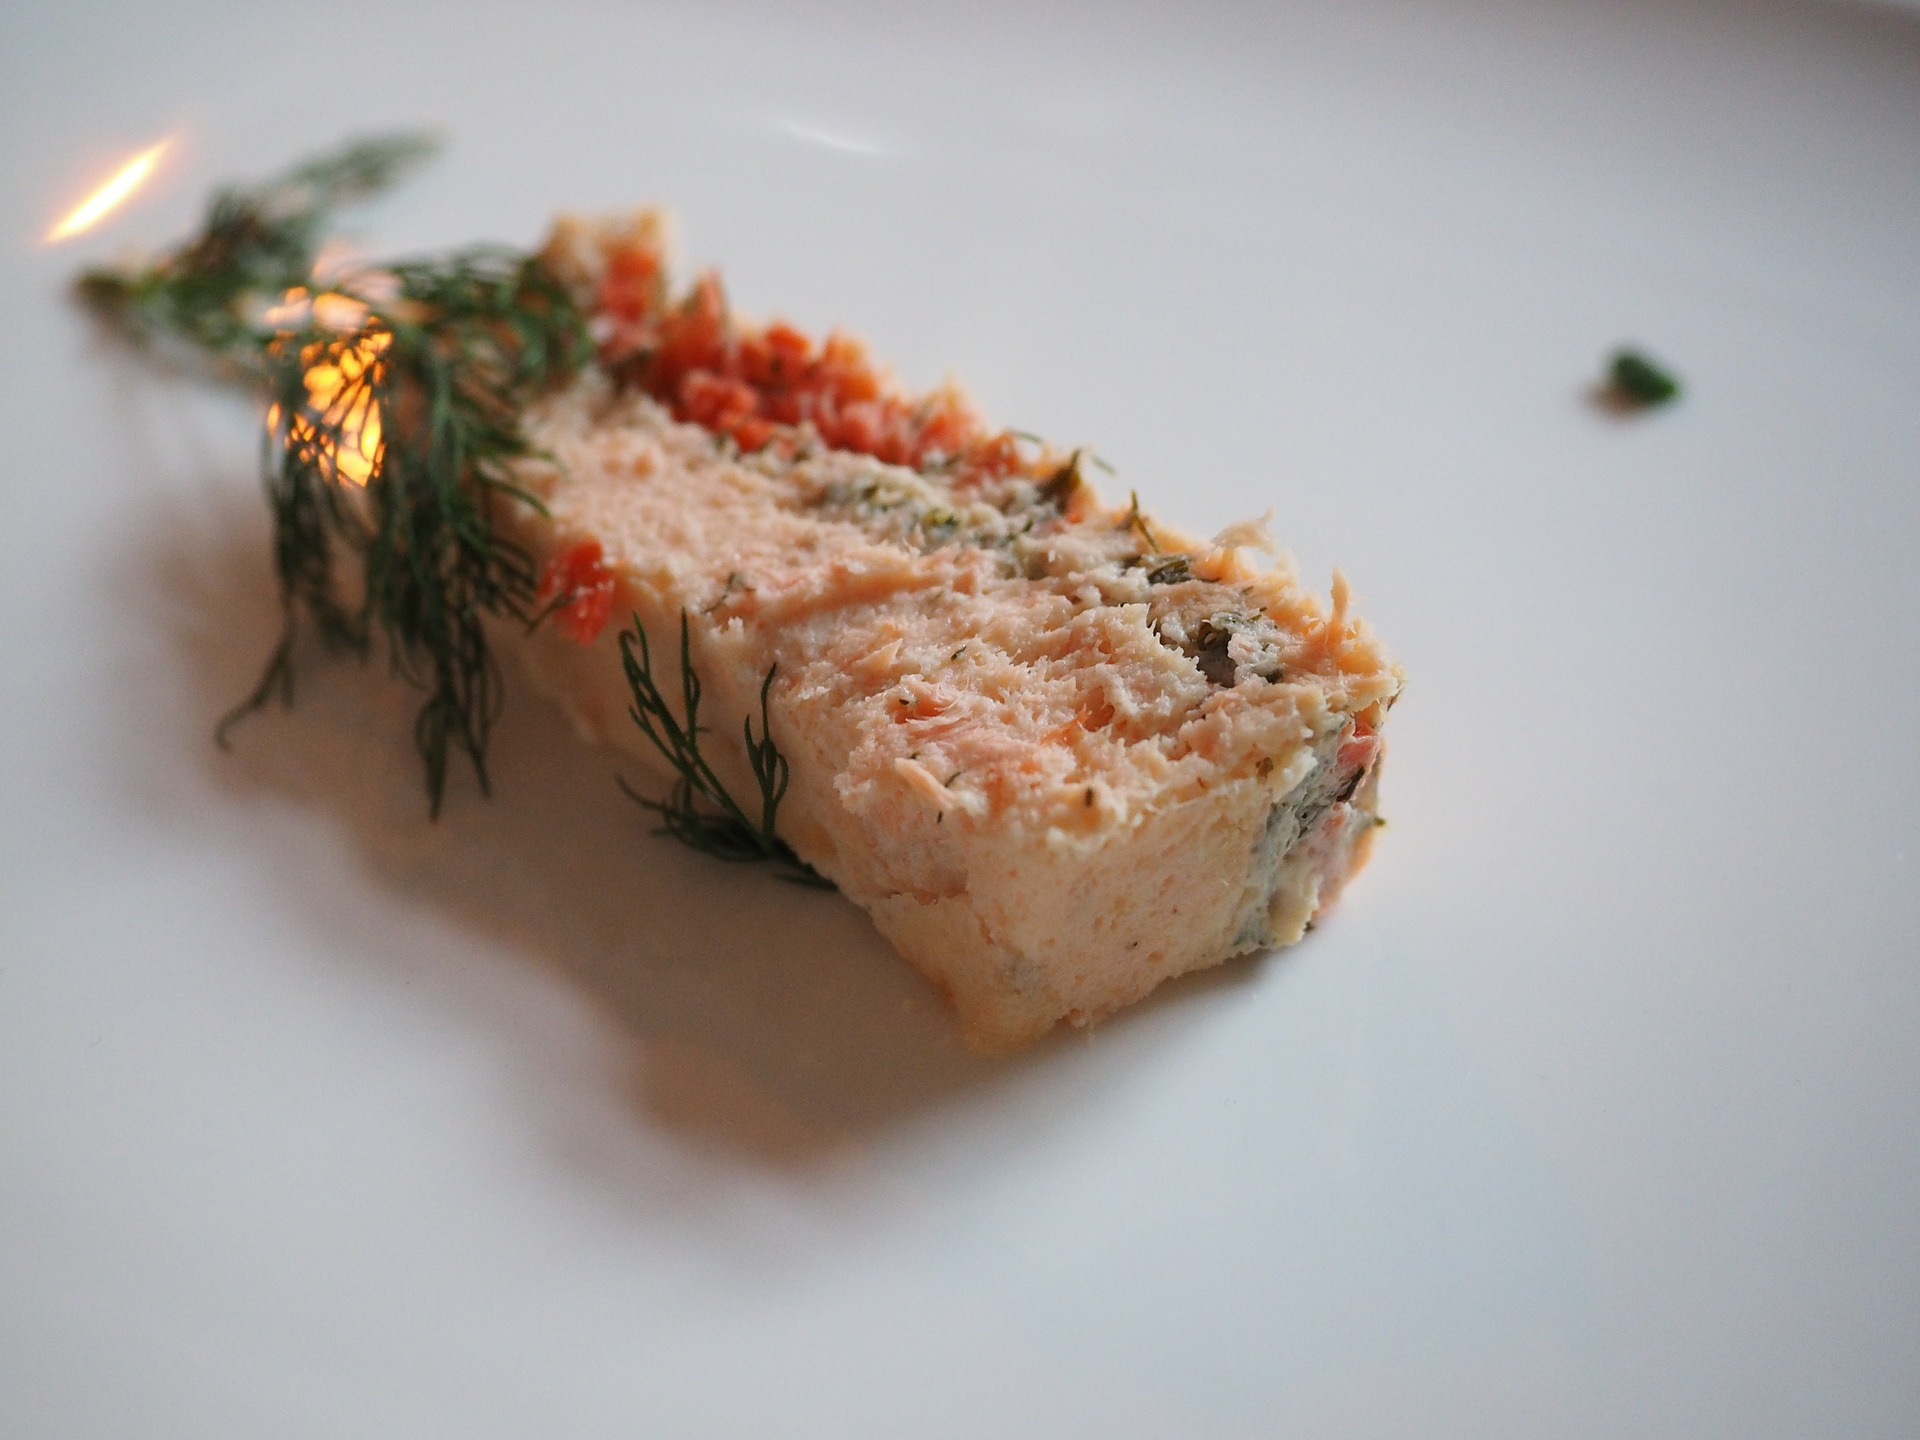 Pâté terrine de saumon